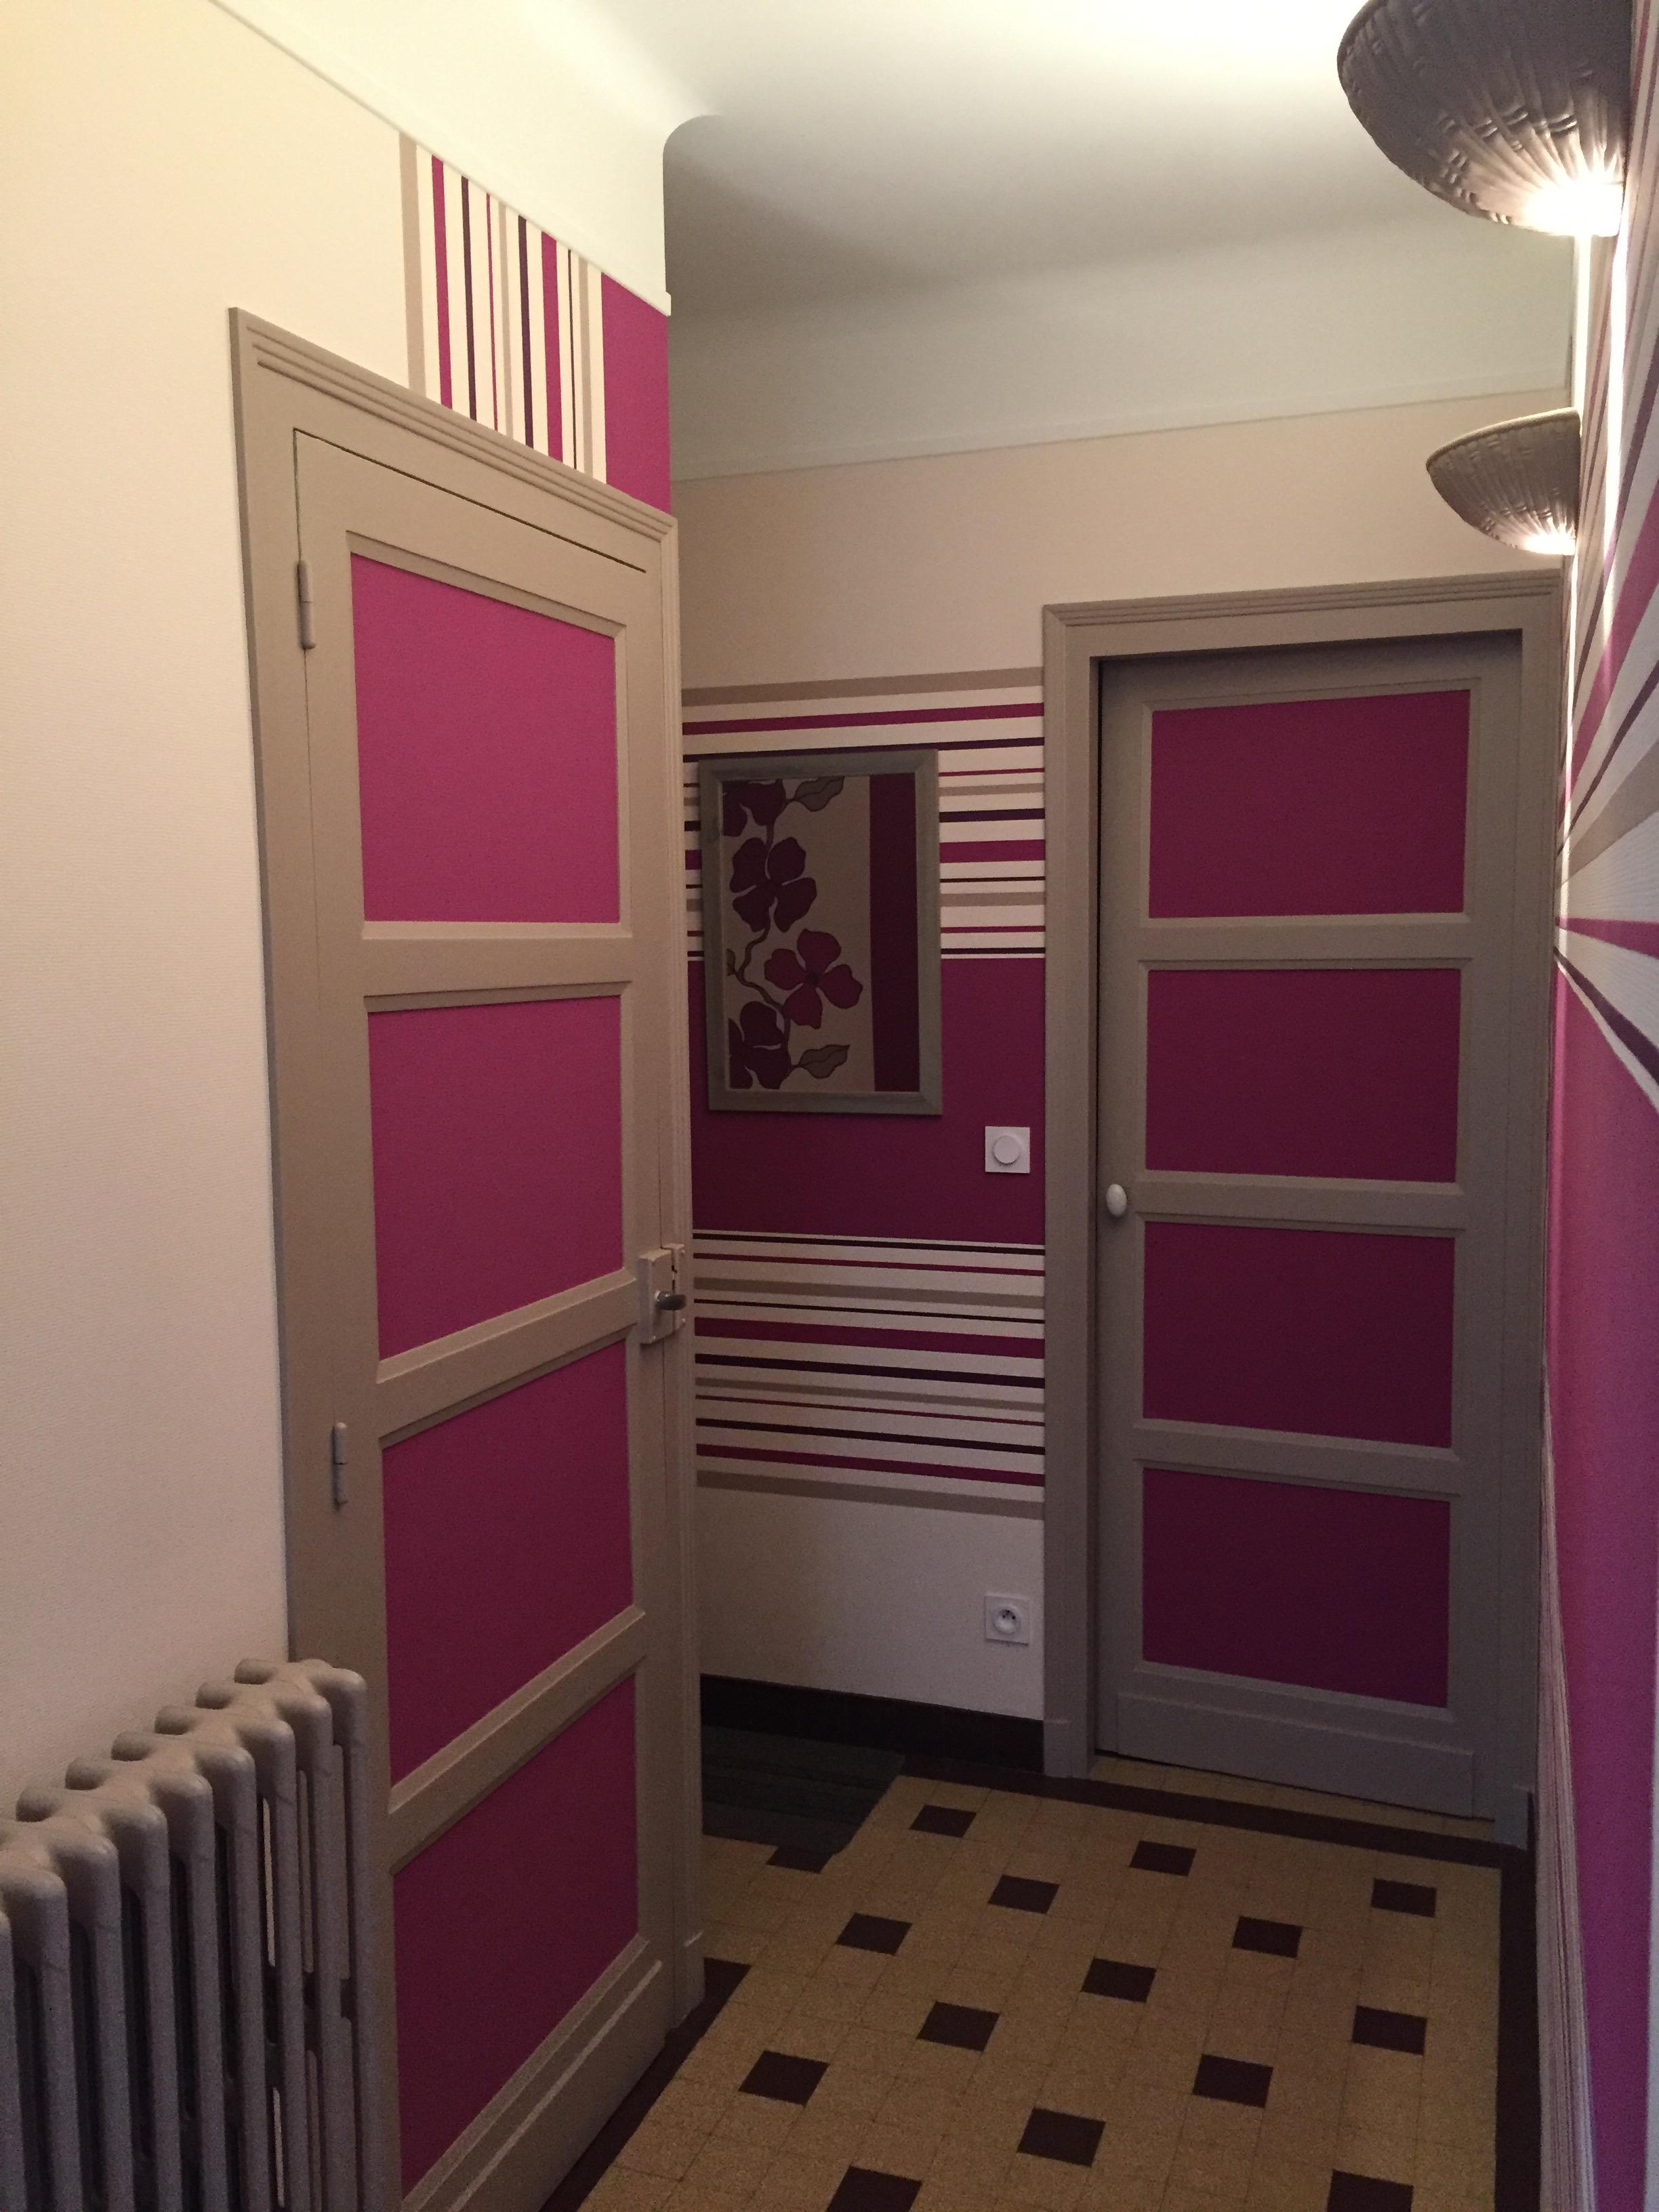 papier peint couloir steve robert peinture. Black Bedroom Furniture Sets. Home Design Ideas